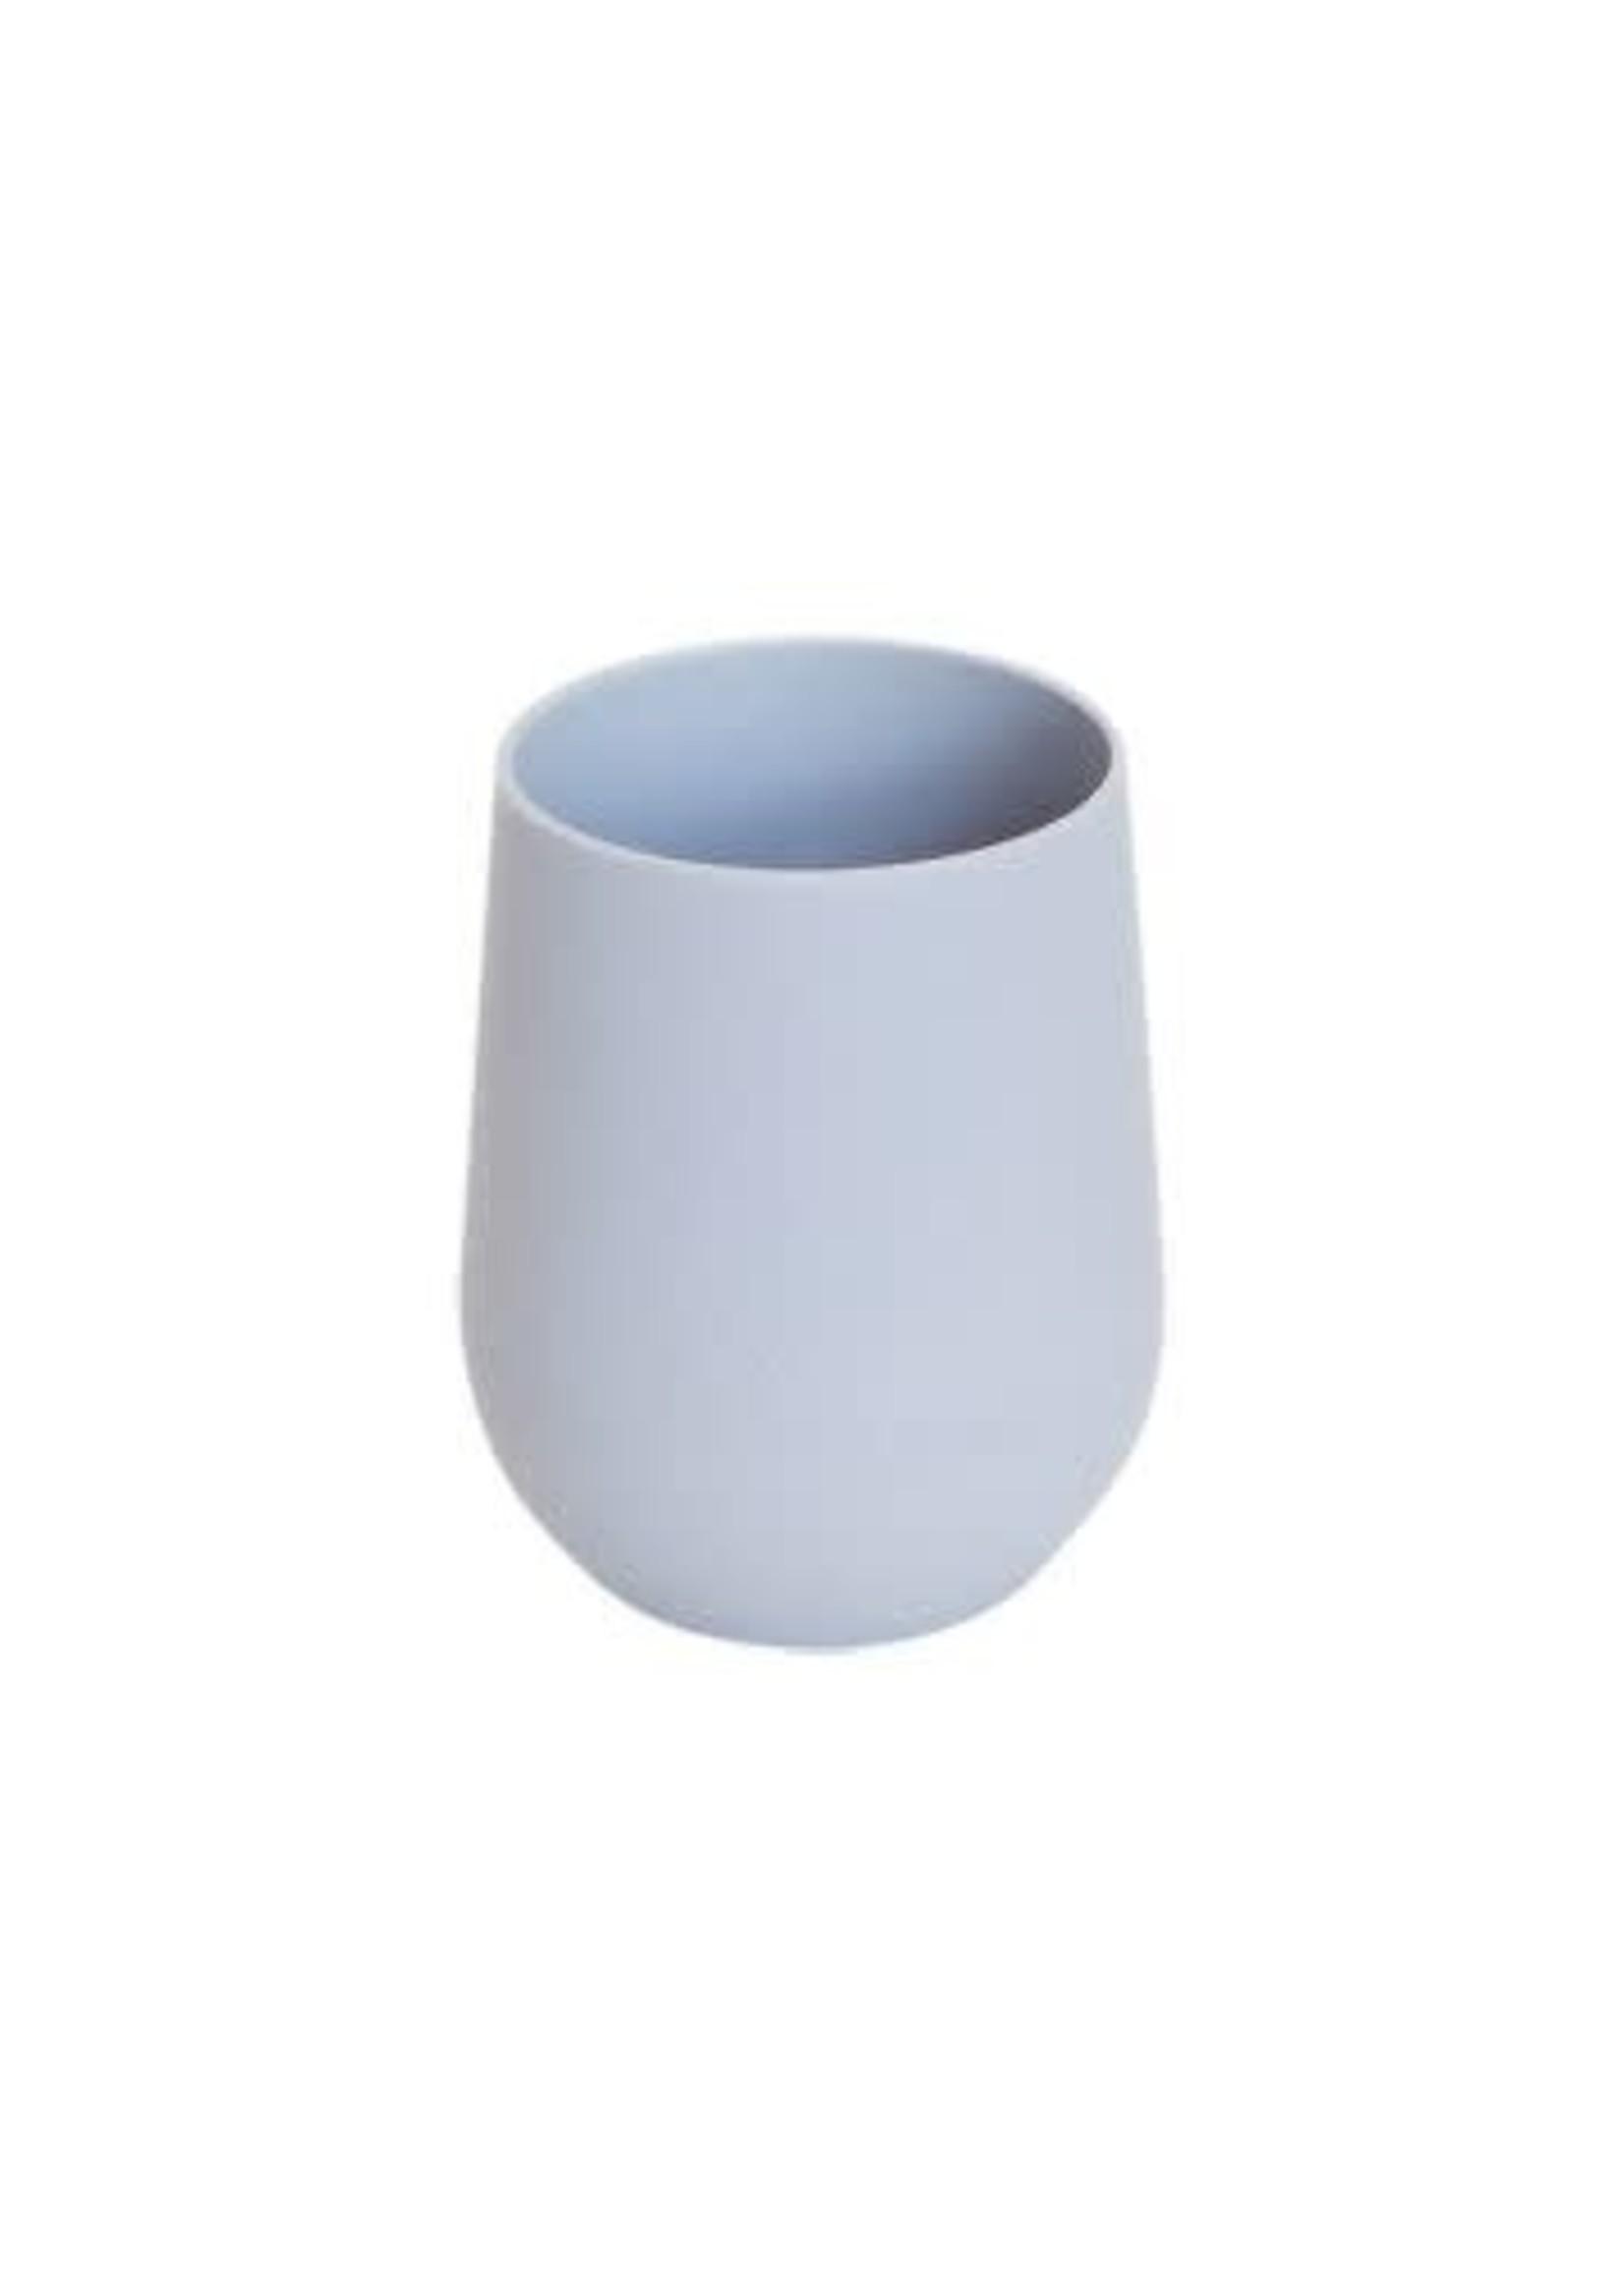 EZPZ ezpz Mini Cup (Pewter)